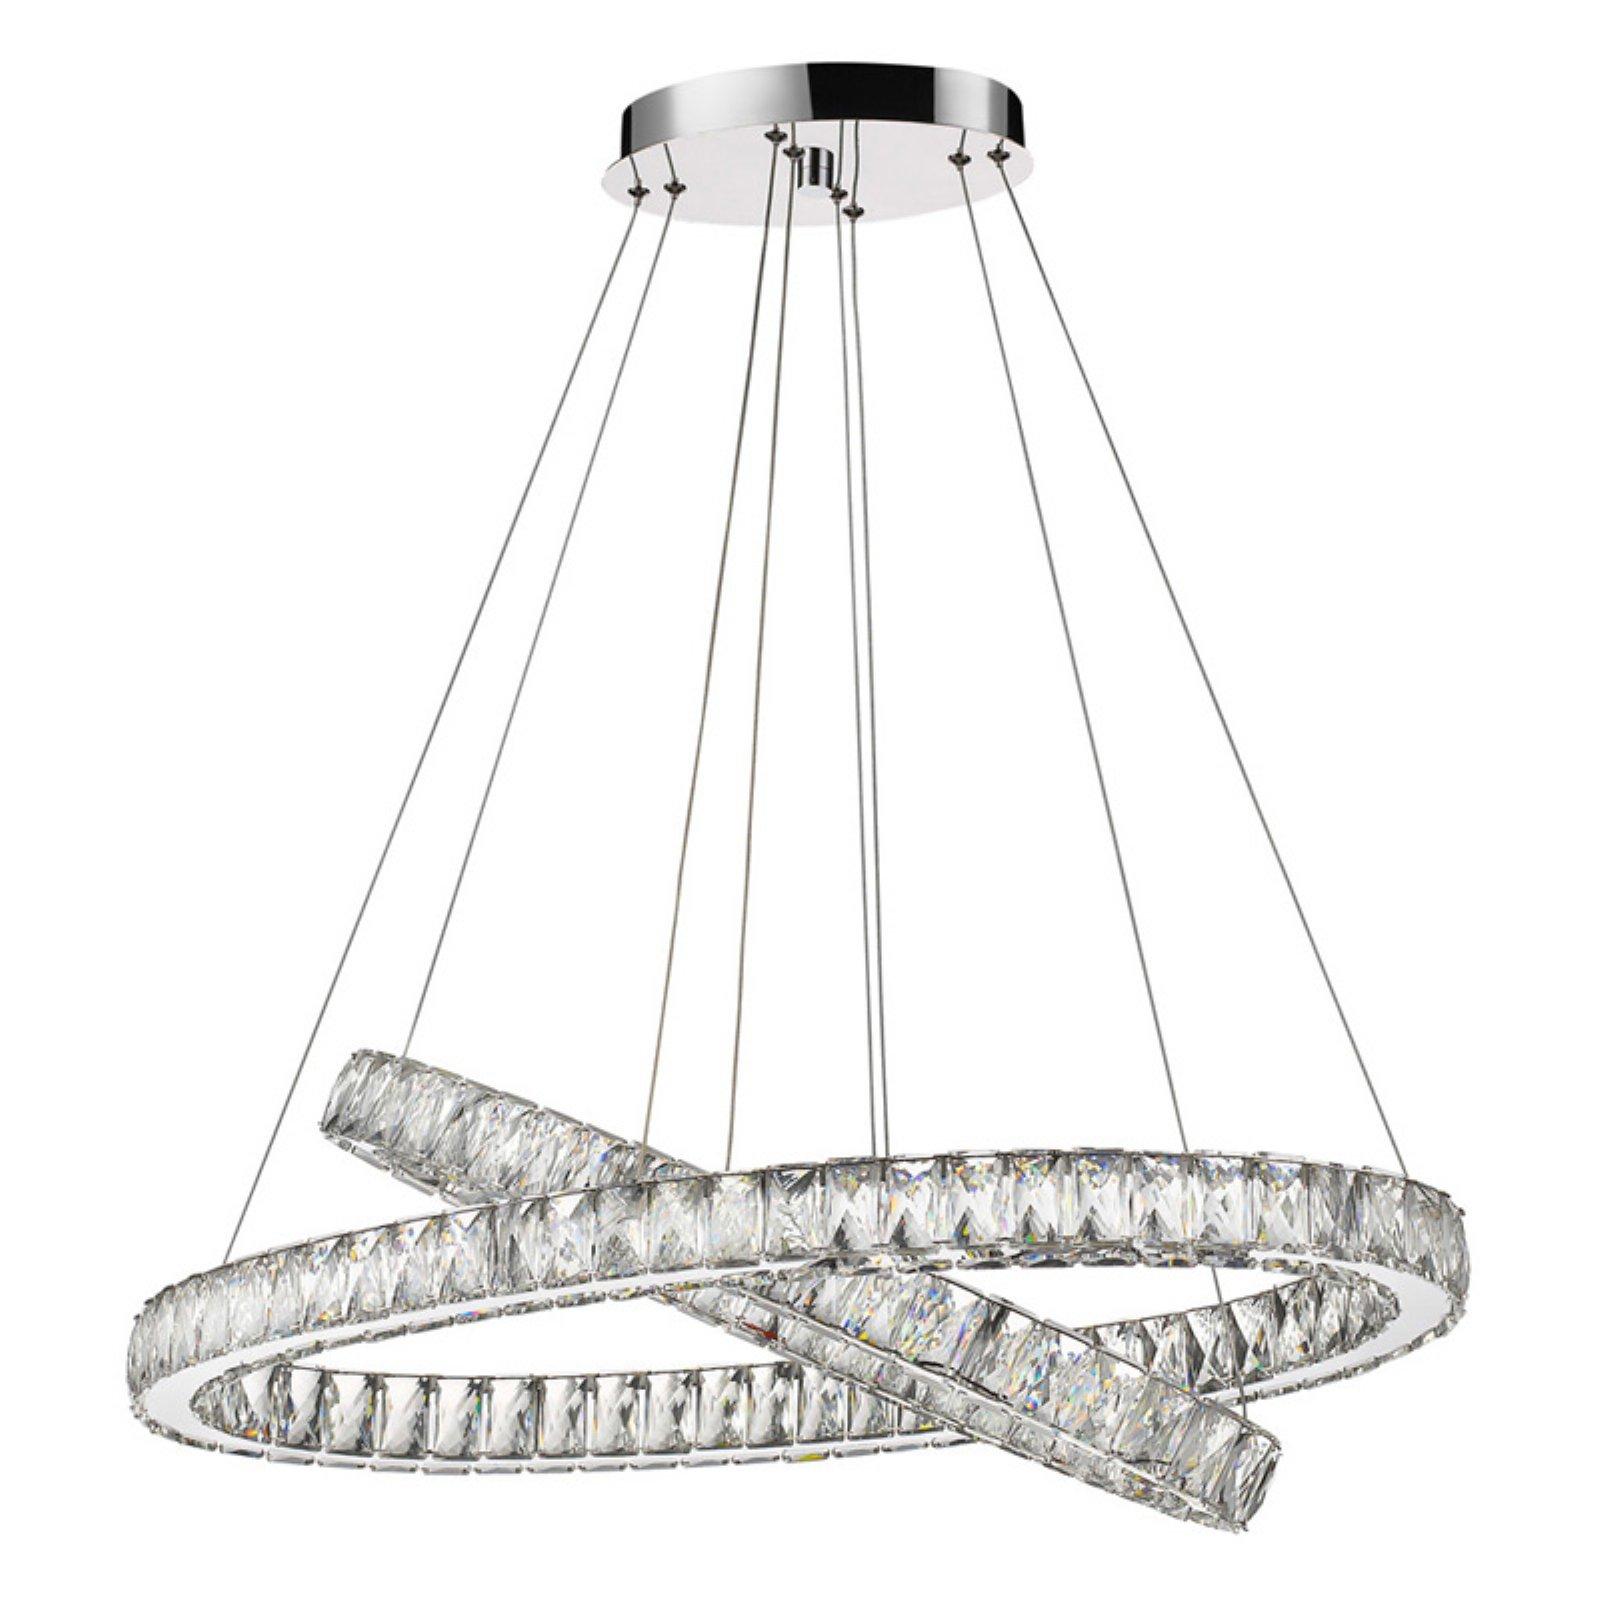 Acclaim Lighting Noemi IN31071 LED Chandelier in 2020